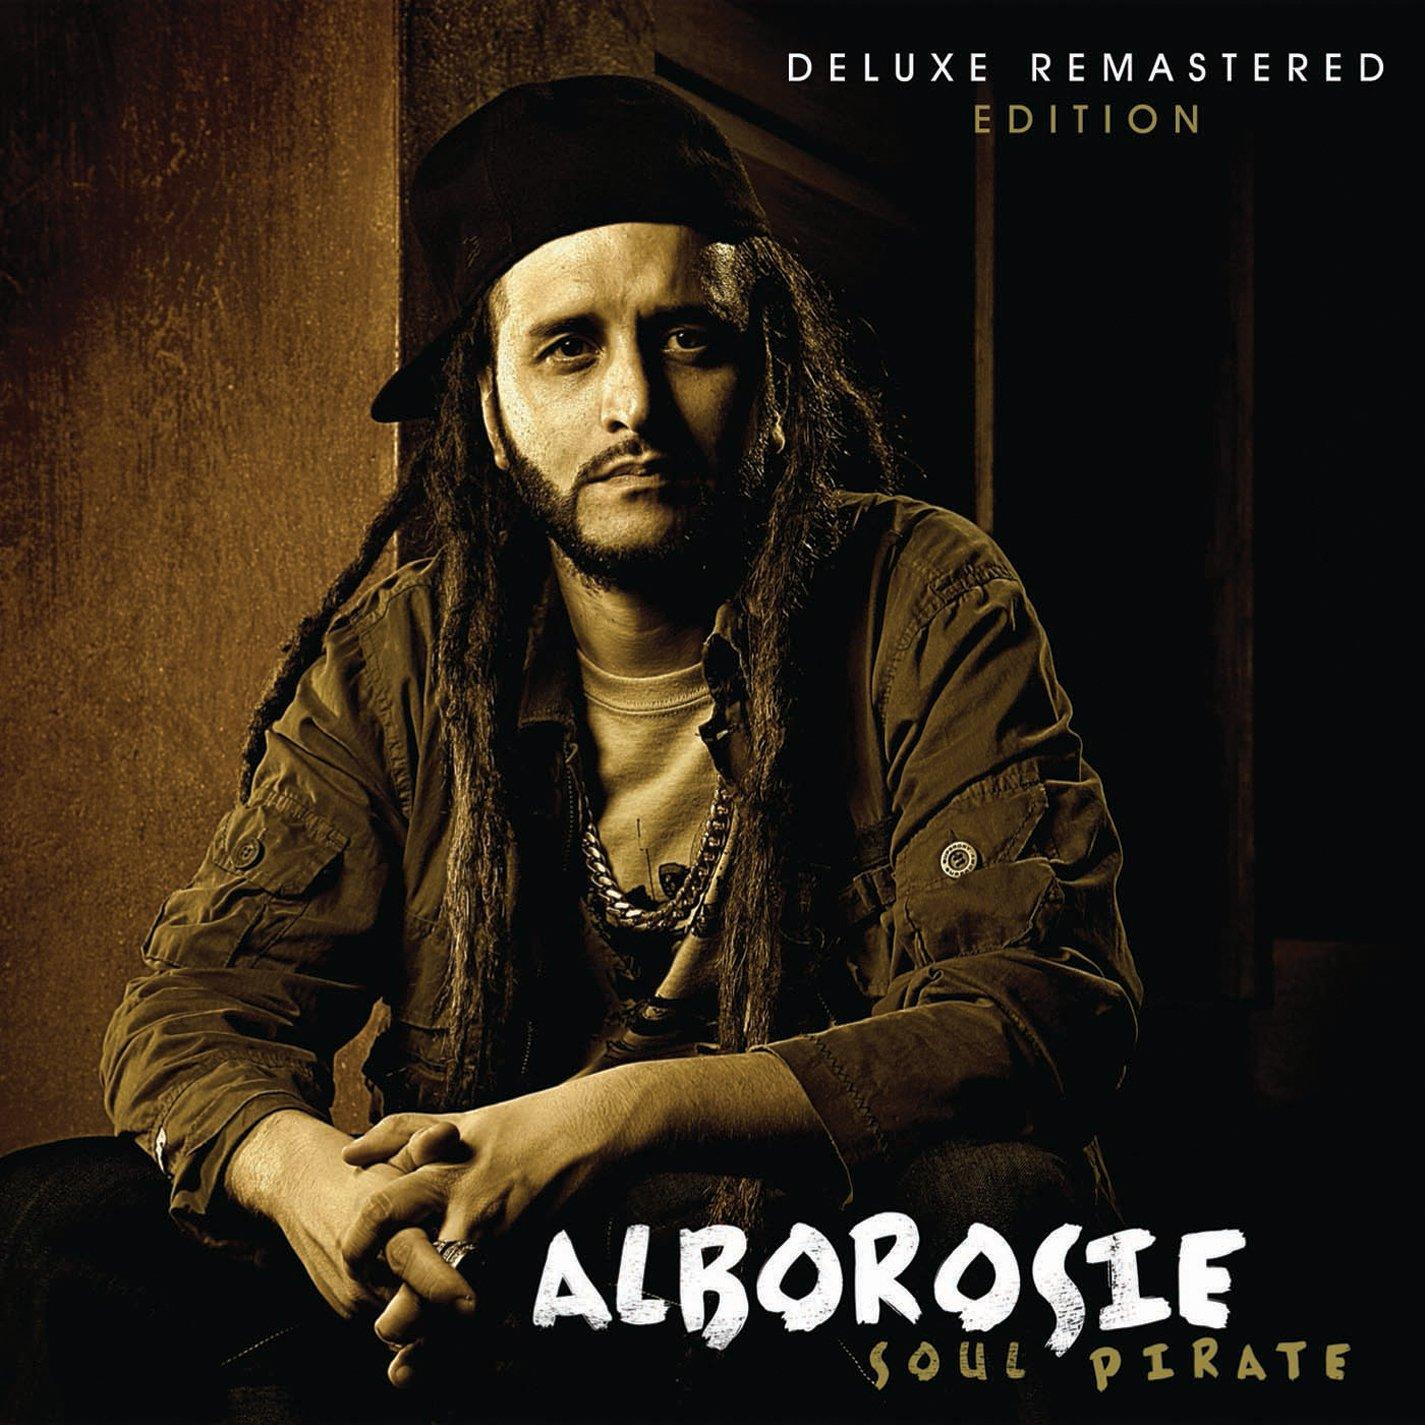 CD : Alborosie - Soul Pirate (CD)